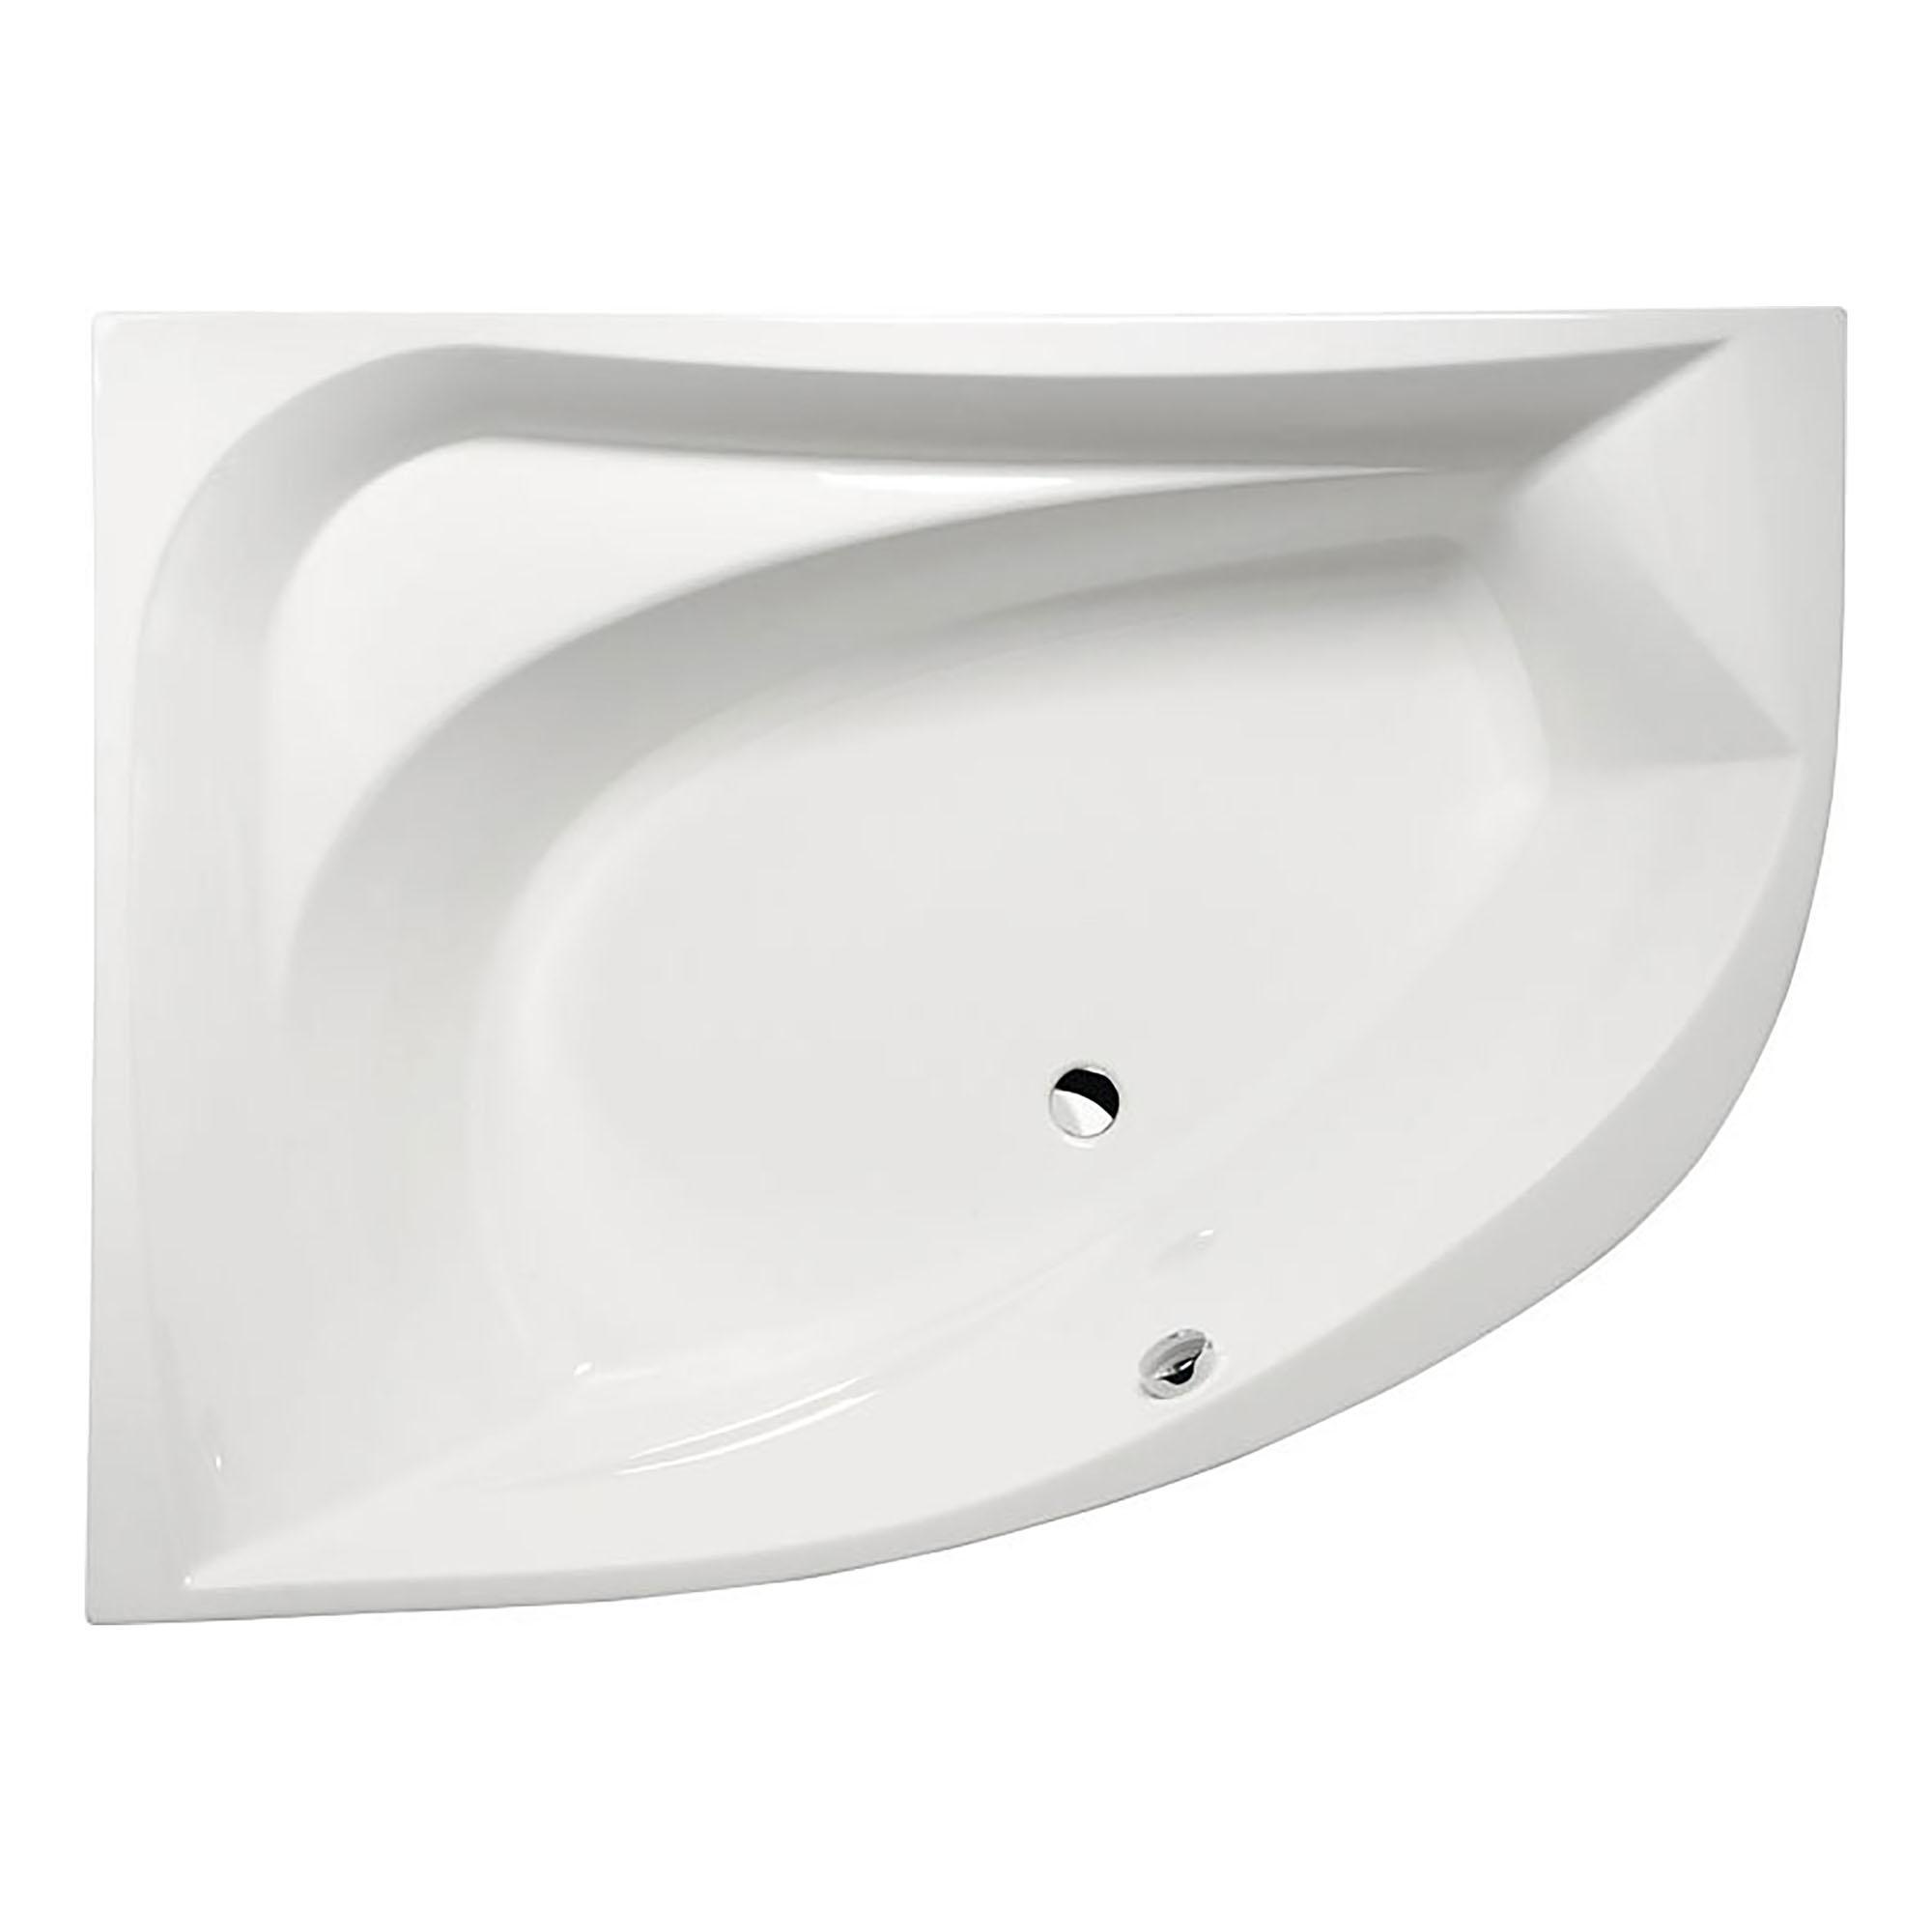 Акриловая ванна Alpen Tanya 160x120 L акриловая ванна alpen astra 165x80 l